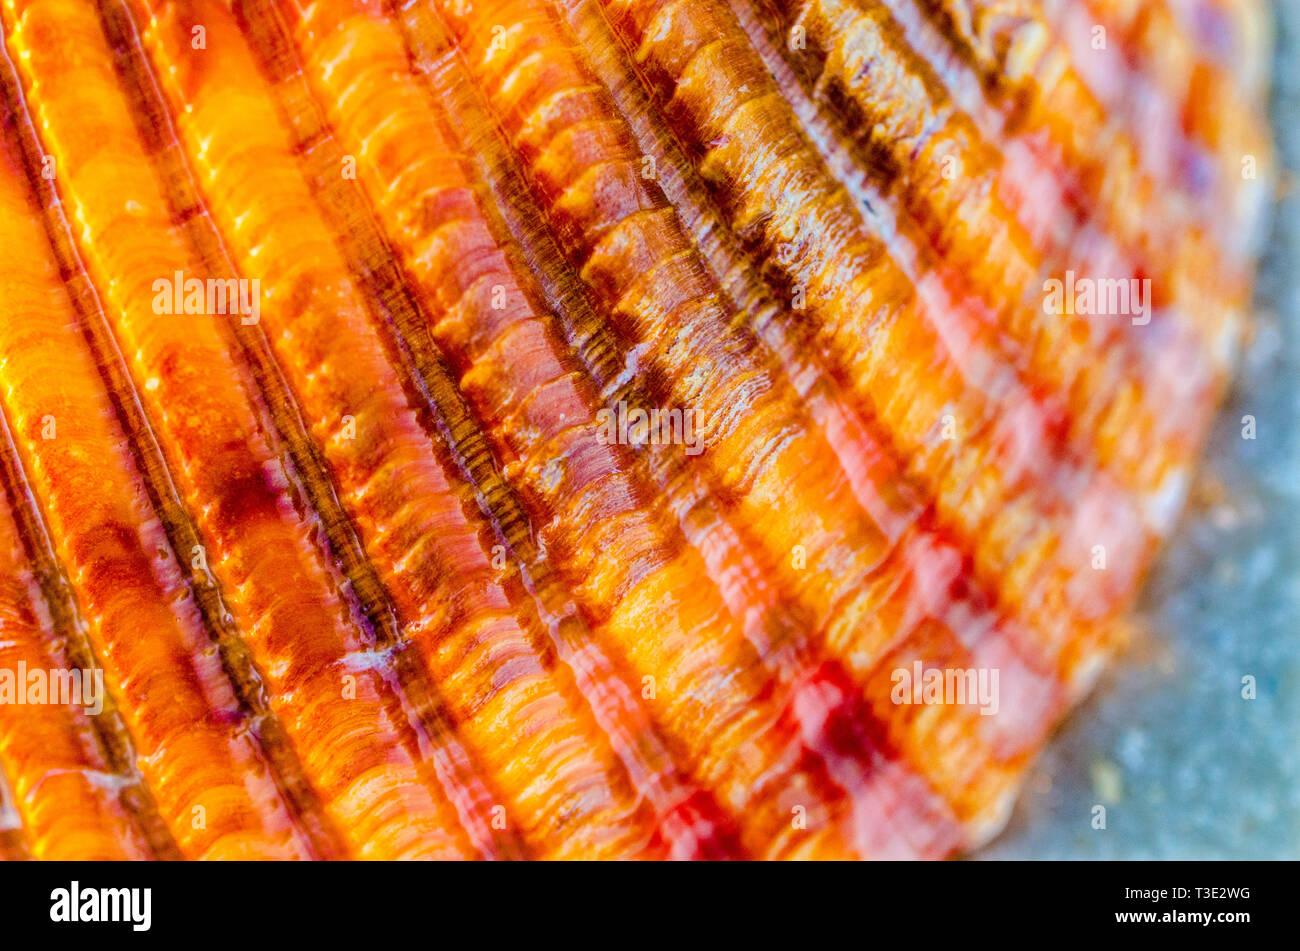 Detail of a Van Hyning's cockleshell found on Dauphin Island, Alabama, Nov. 5, 2013. - Stock Image